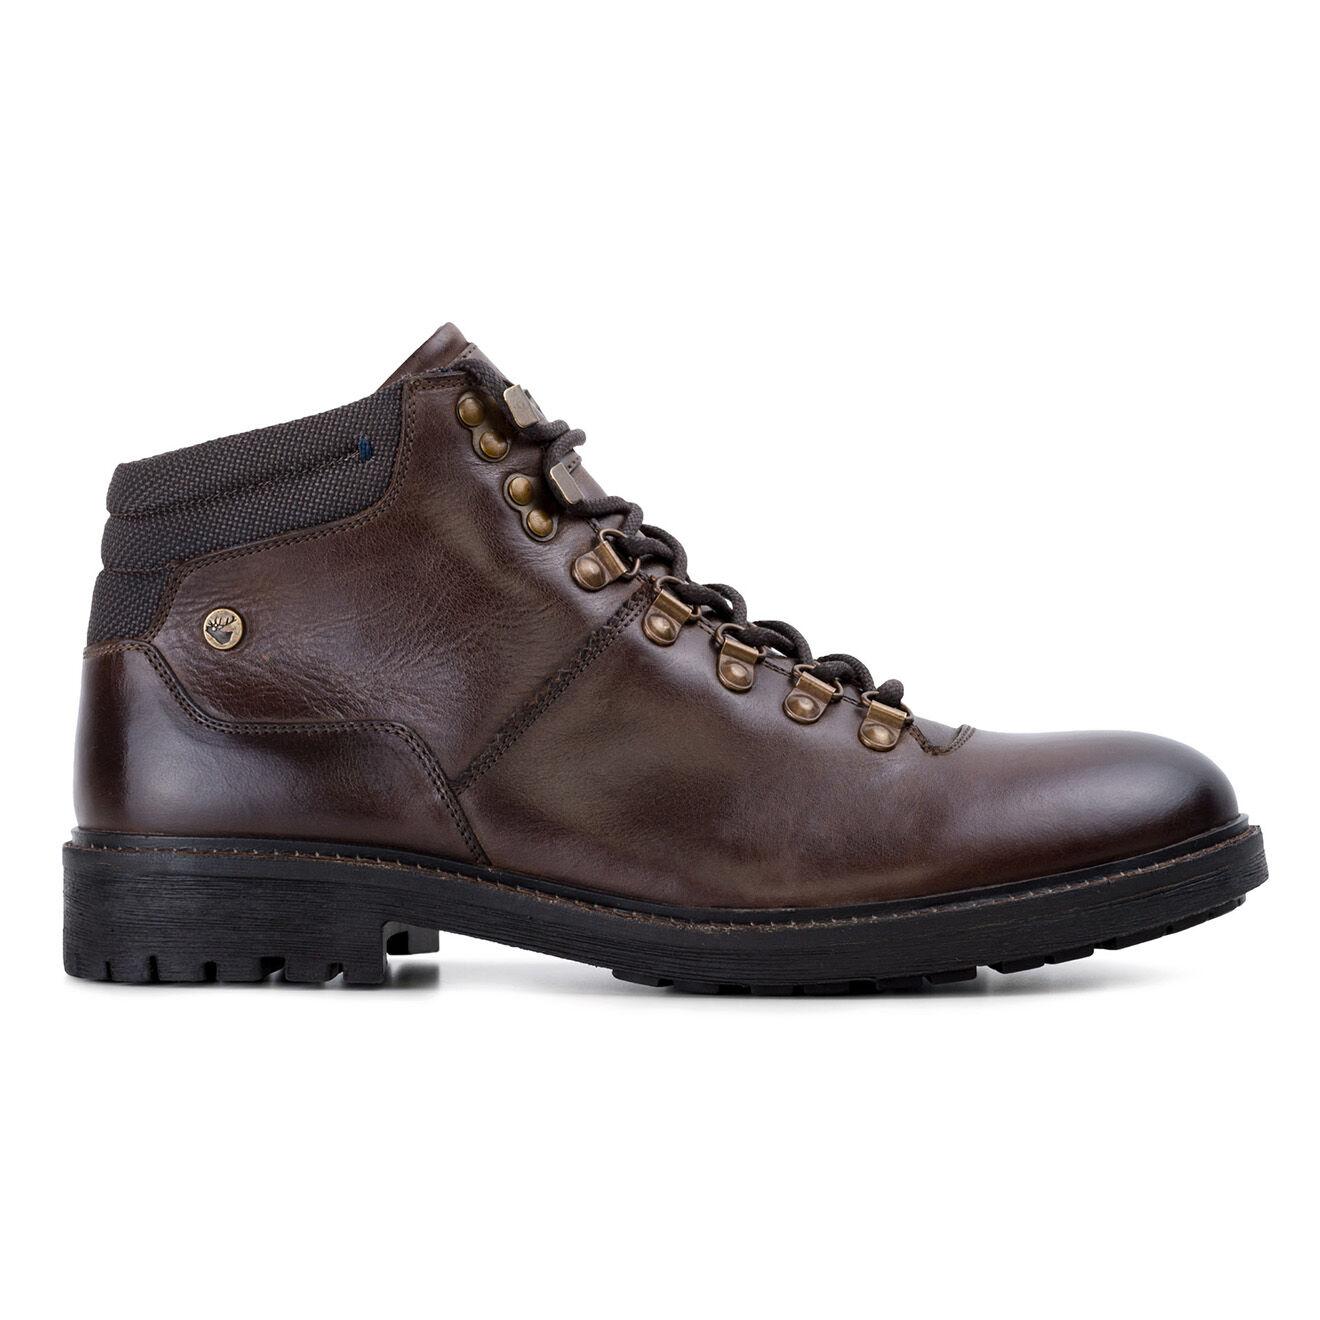 Boots en Cuir Zac marron